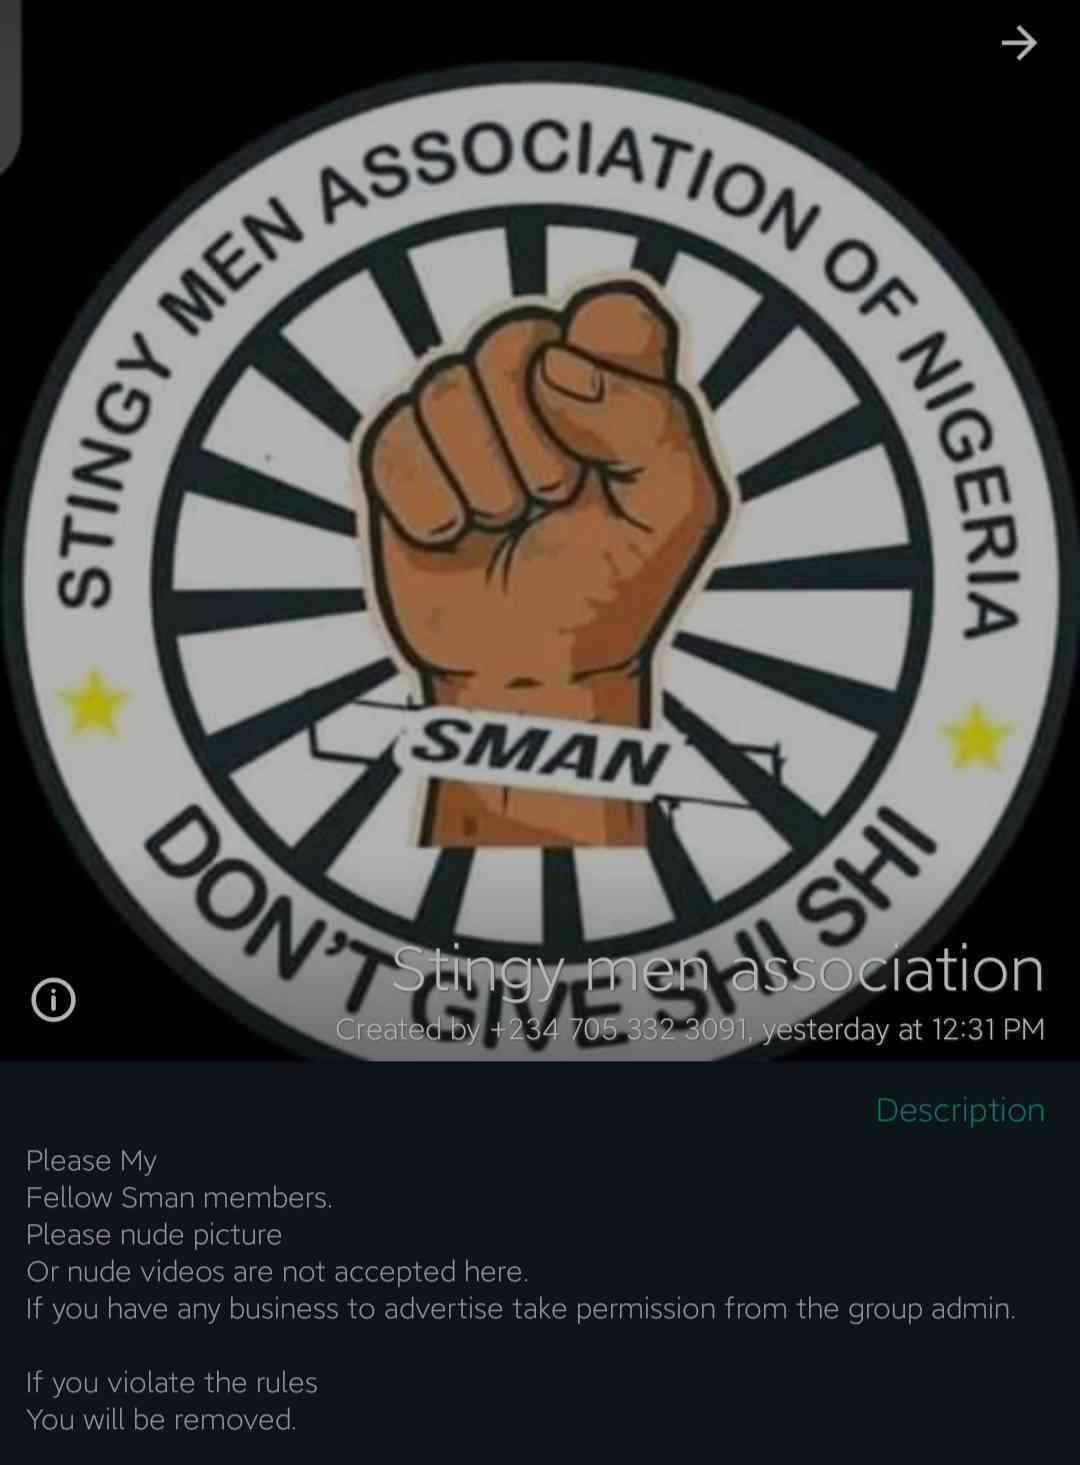 SMAN/SWAN: The bigger picture